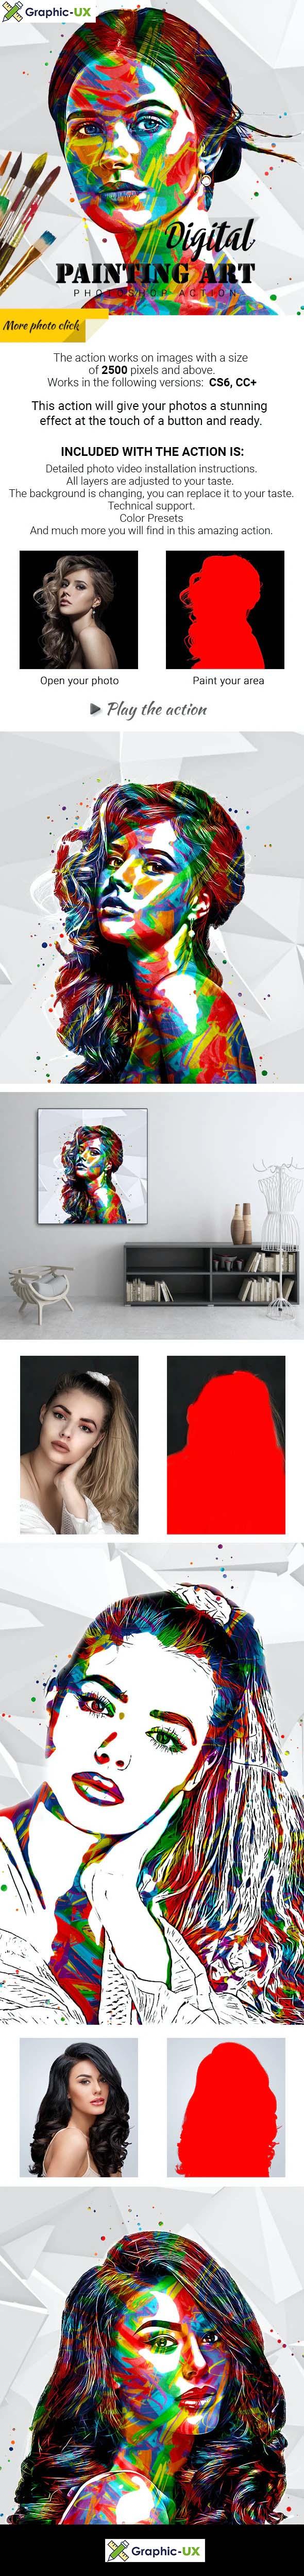 Digital Painting Art Photoshop Action